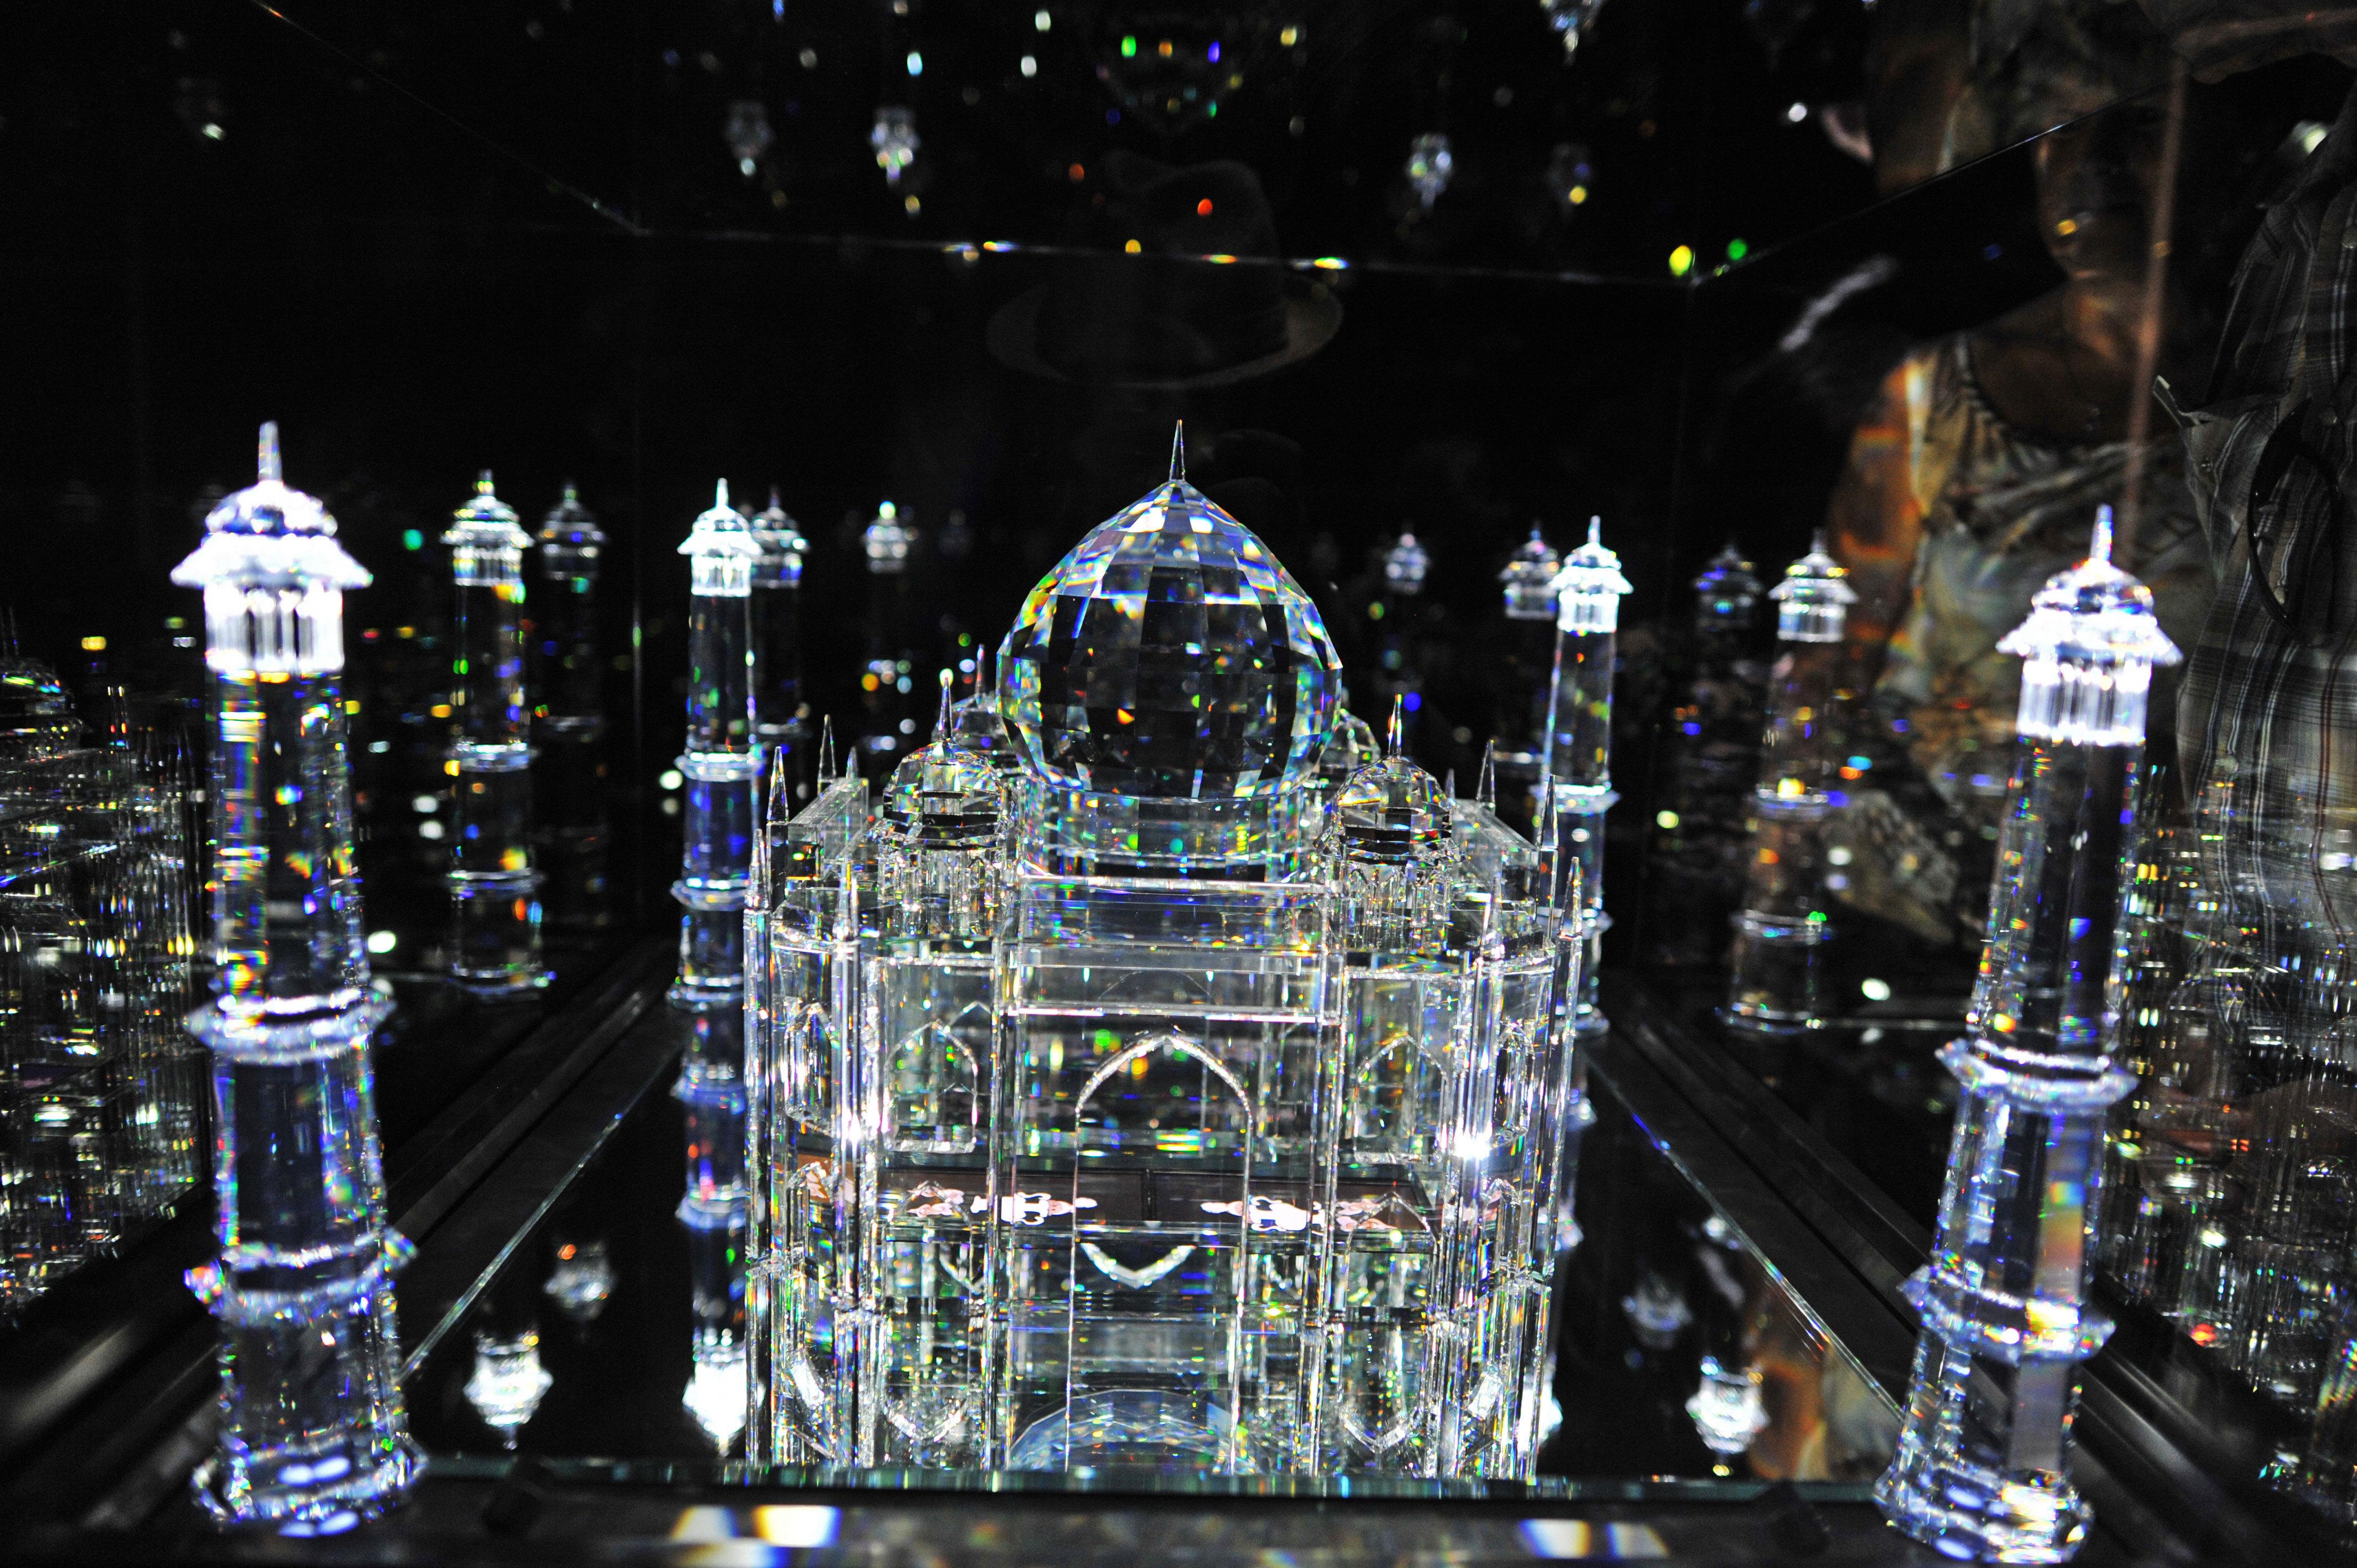 Innsbruck and Swarovski's Crystal World: Full Day Trip from Munich